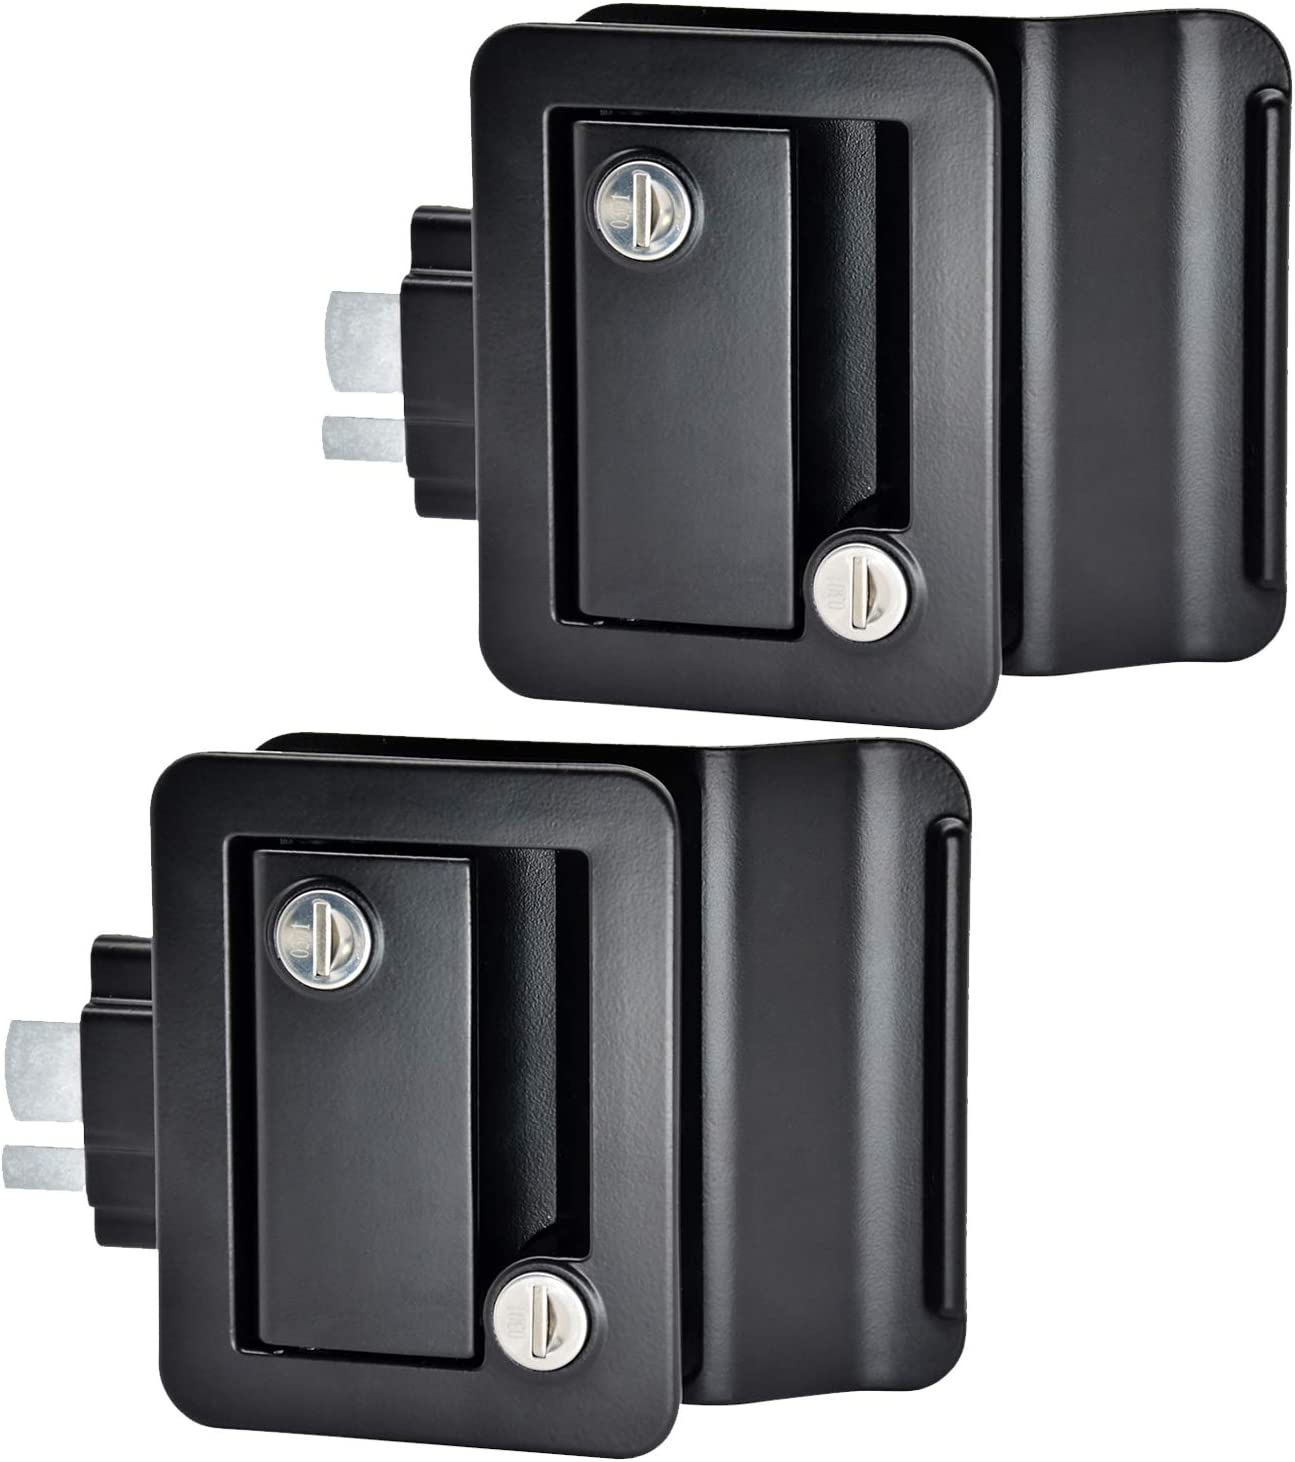 YOMILINK Upgraded RV unisex Door Classic Lock 2 Keyed Pack Same Alike Key Bl